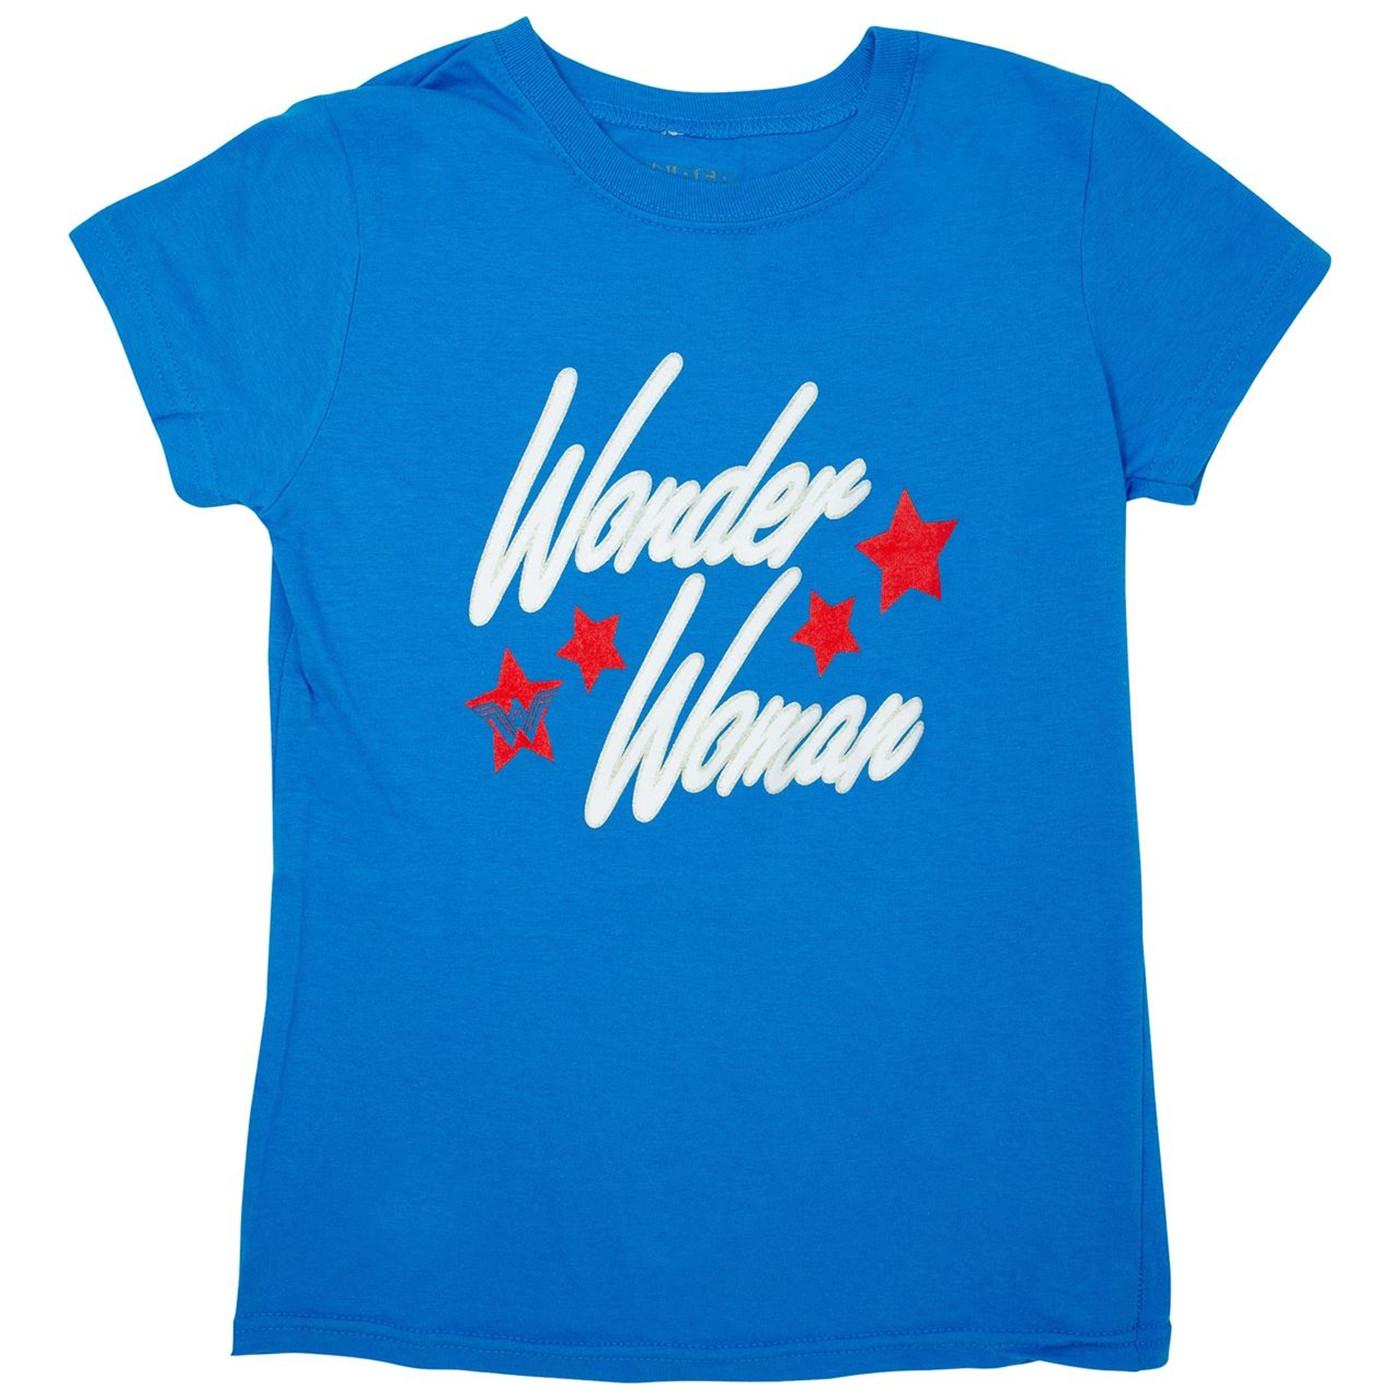 Wonder Woman Retro Blue T-Shirt